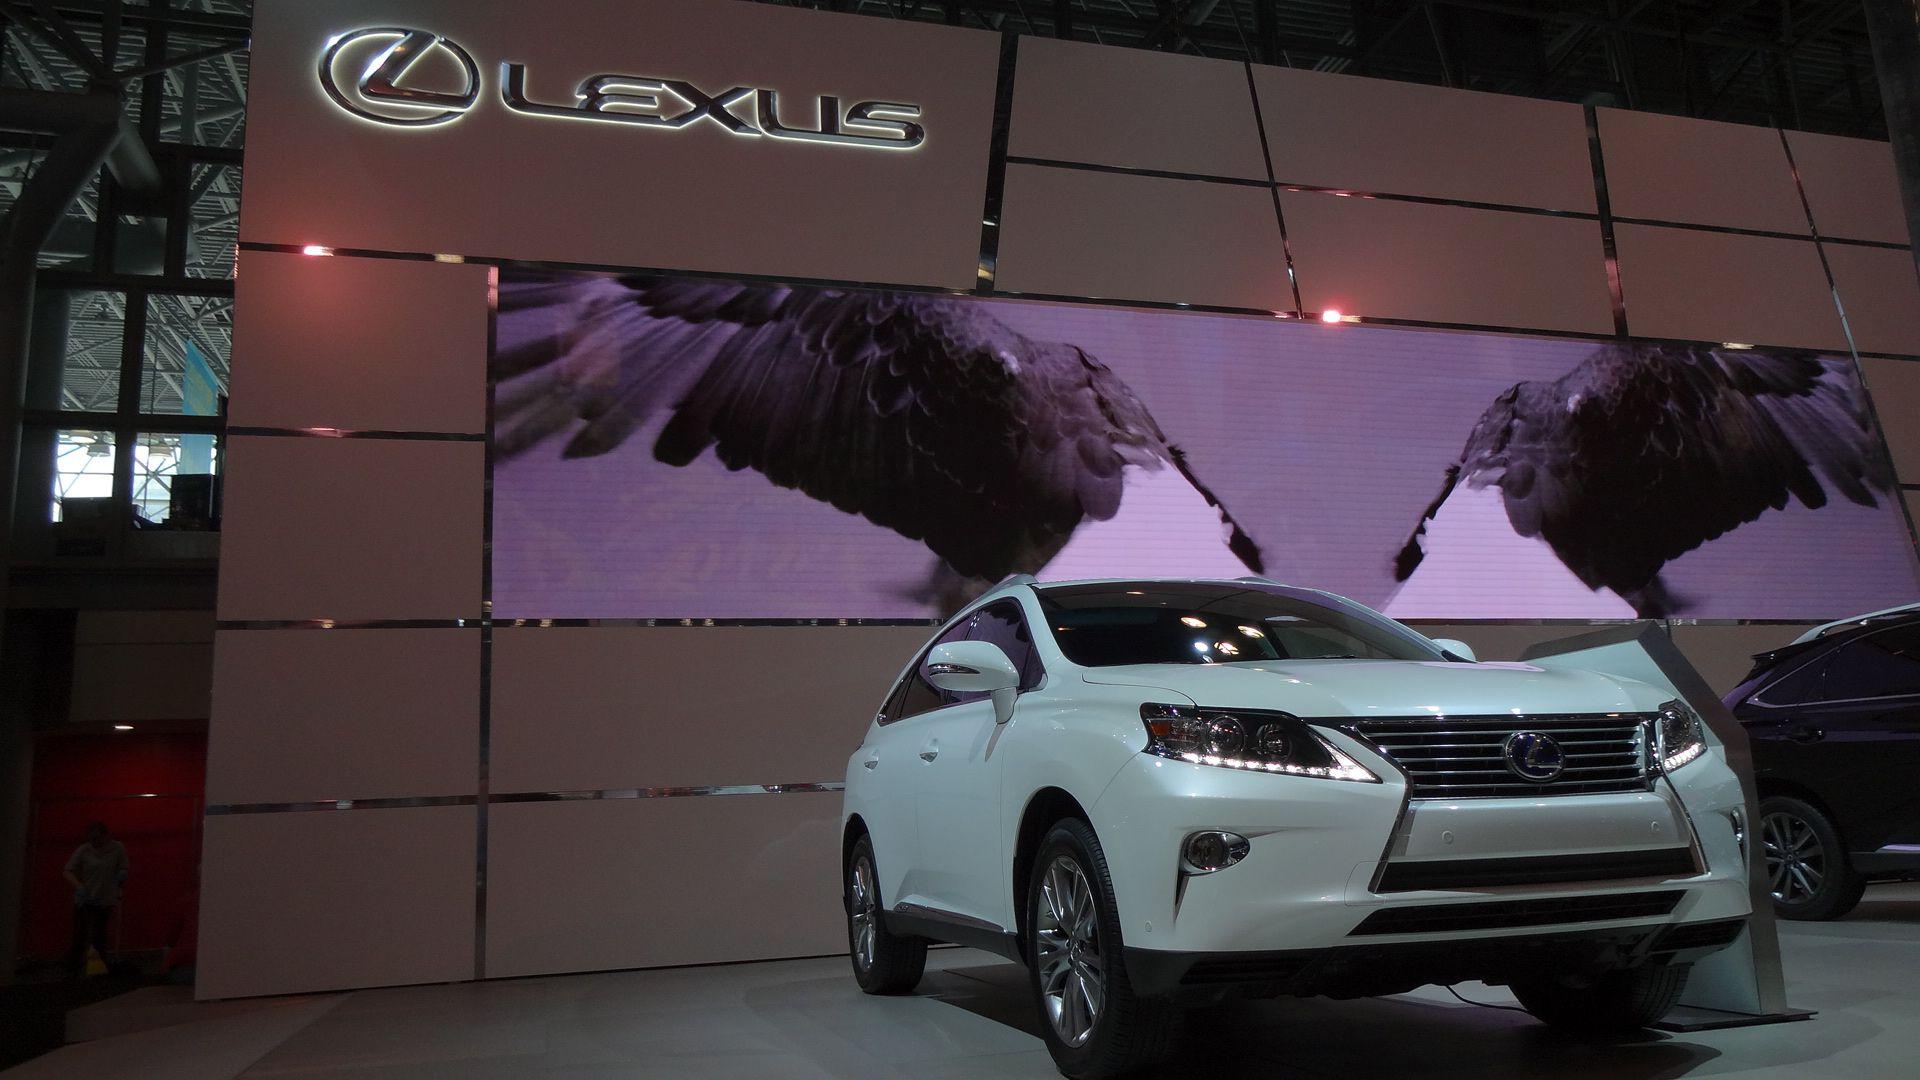 0dcde52c7072dd5b01504fc448055e25 Great Description About 2012 Lexus Es with Fascinating Images Cars Review